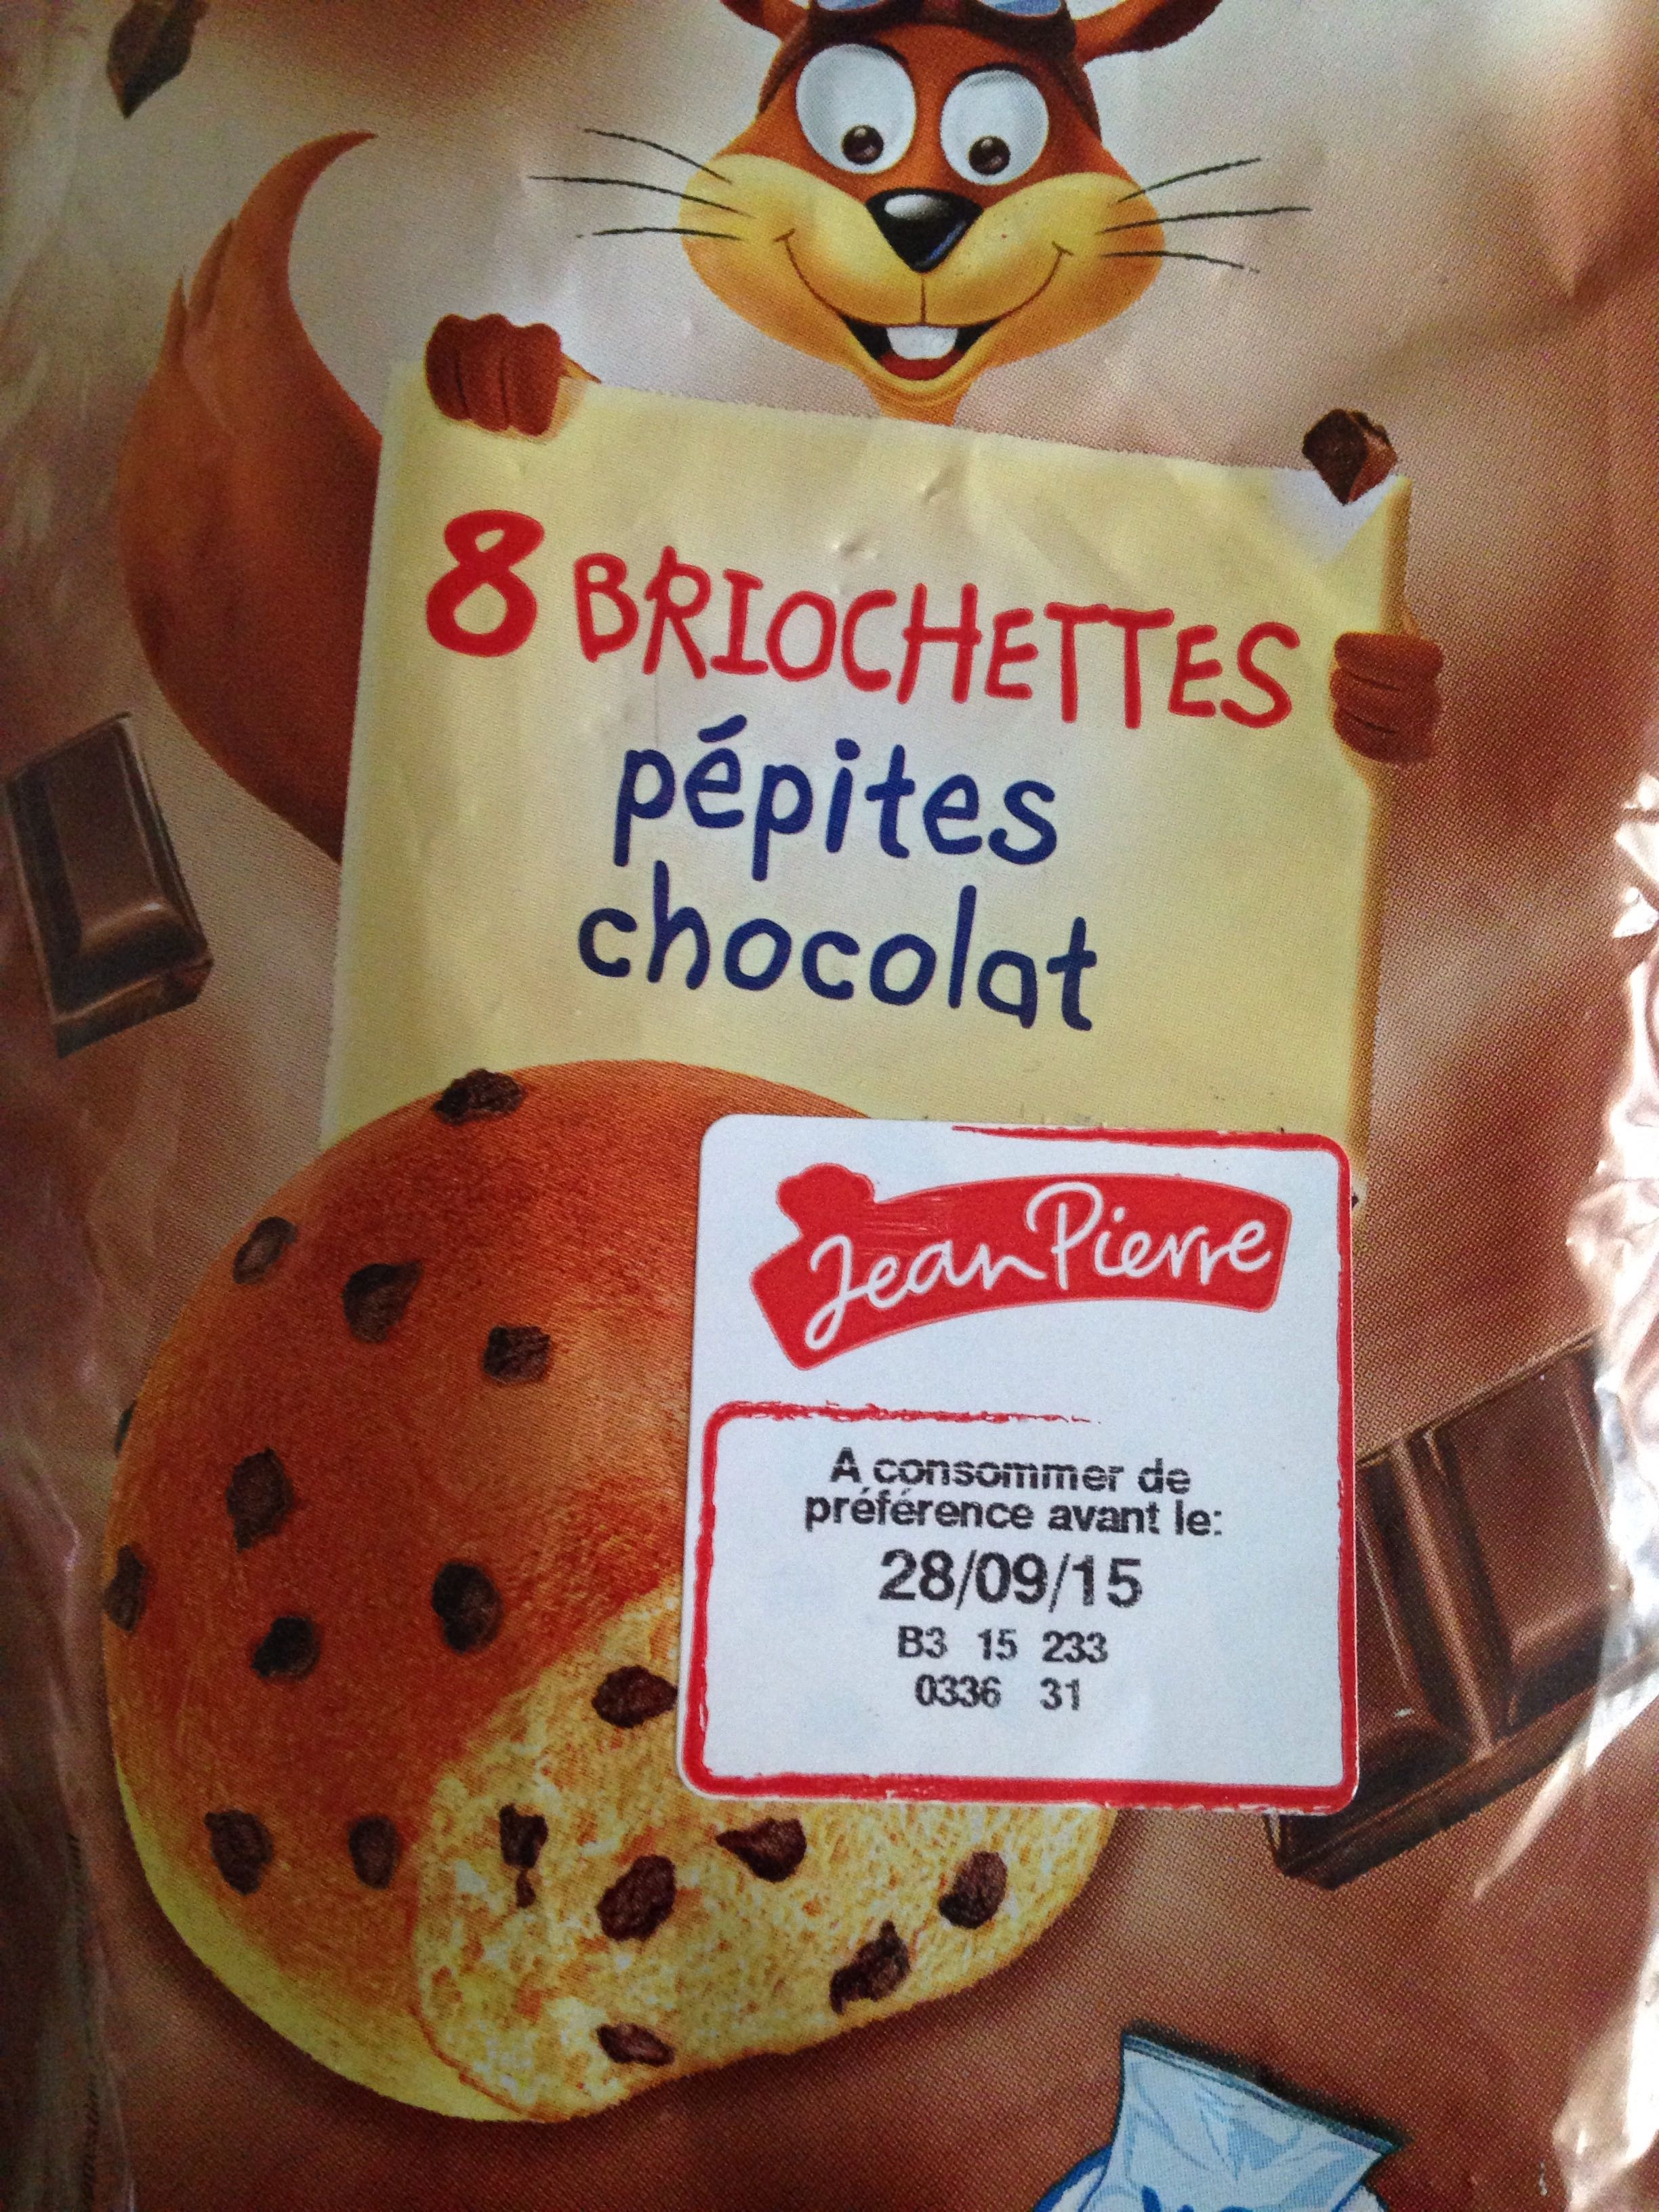 8 briochettes pépites chocolat - Product